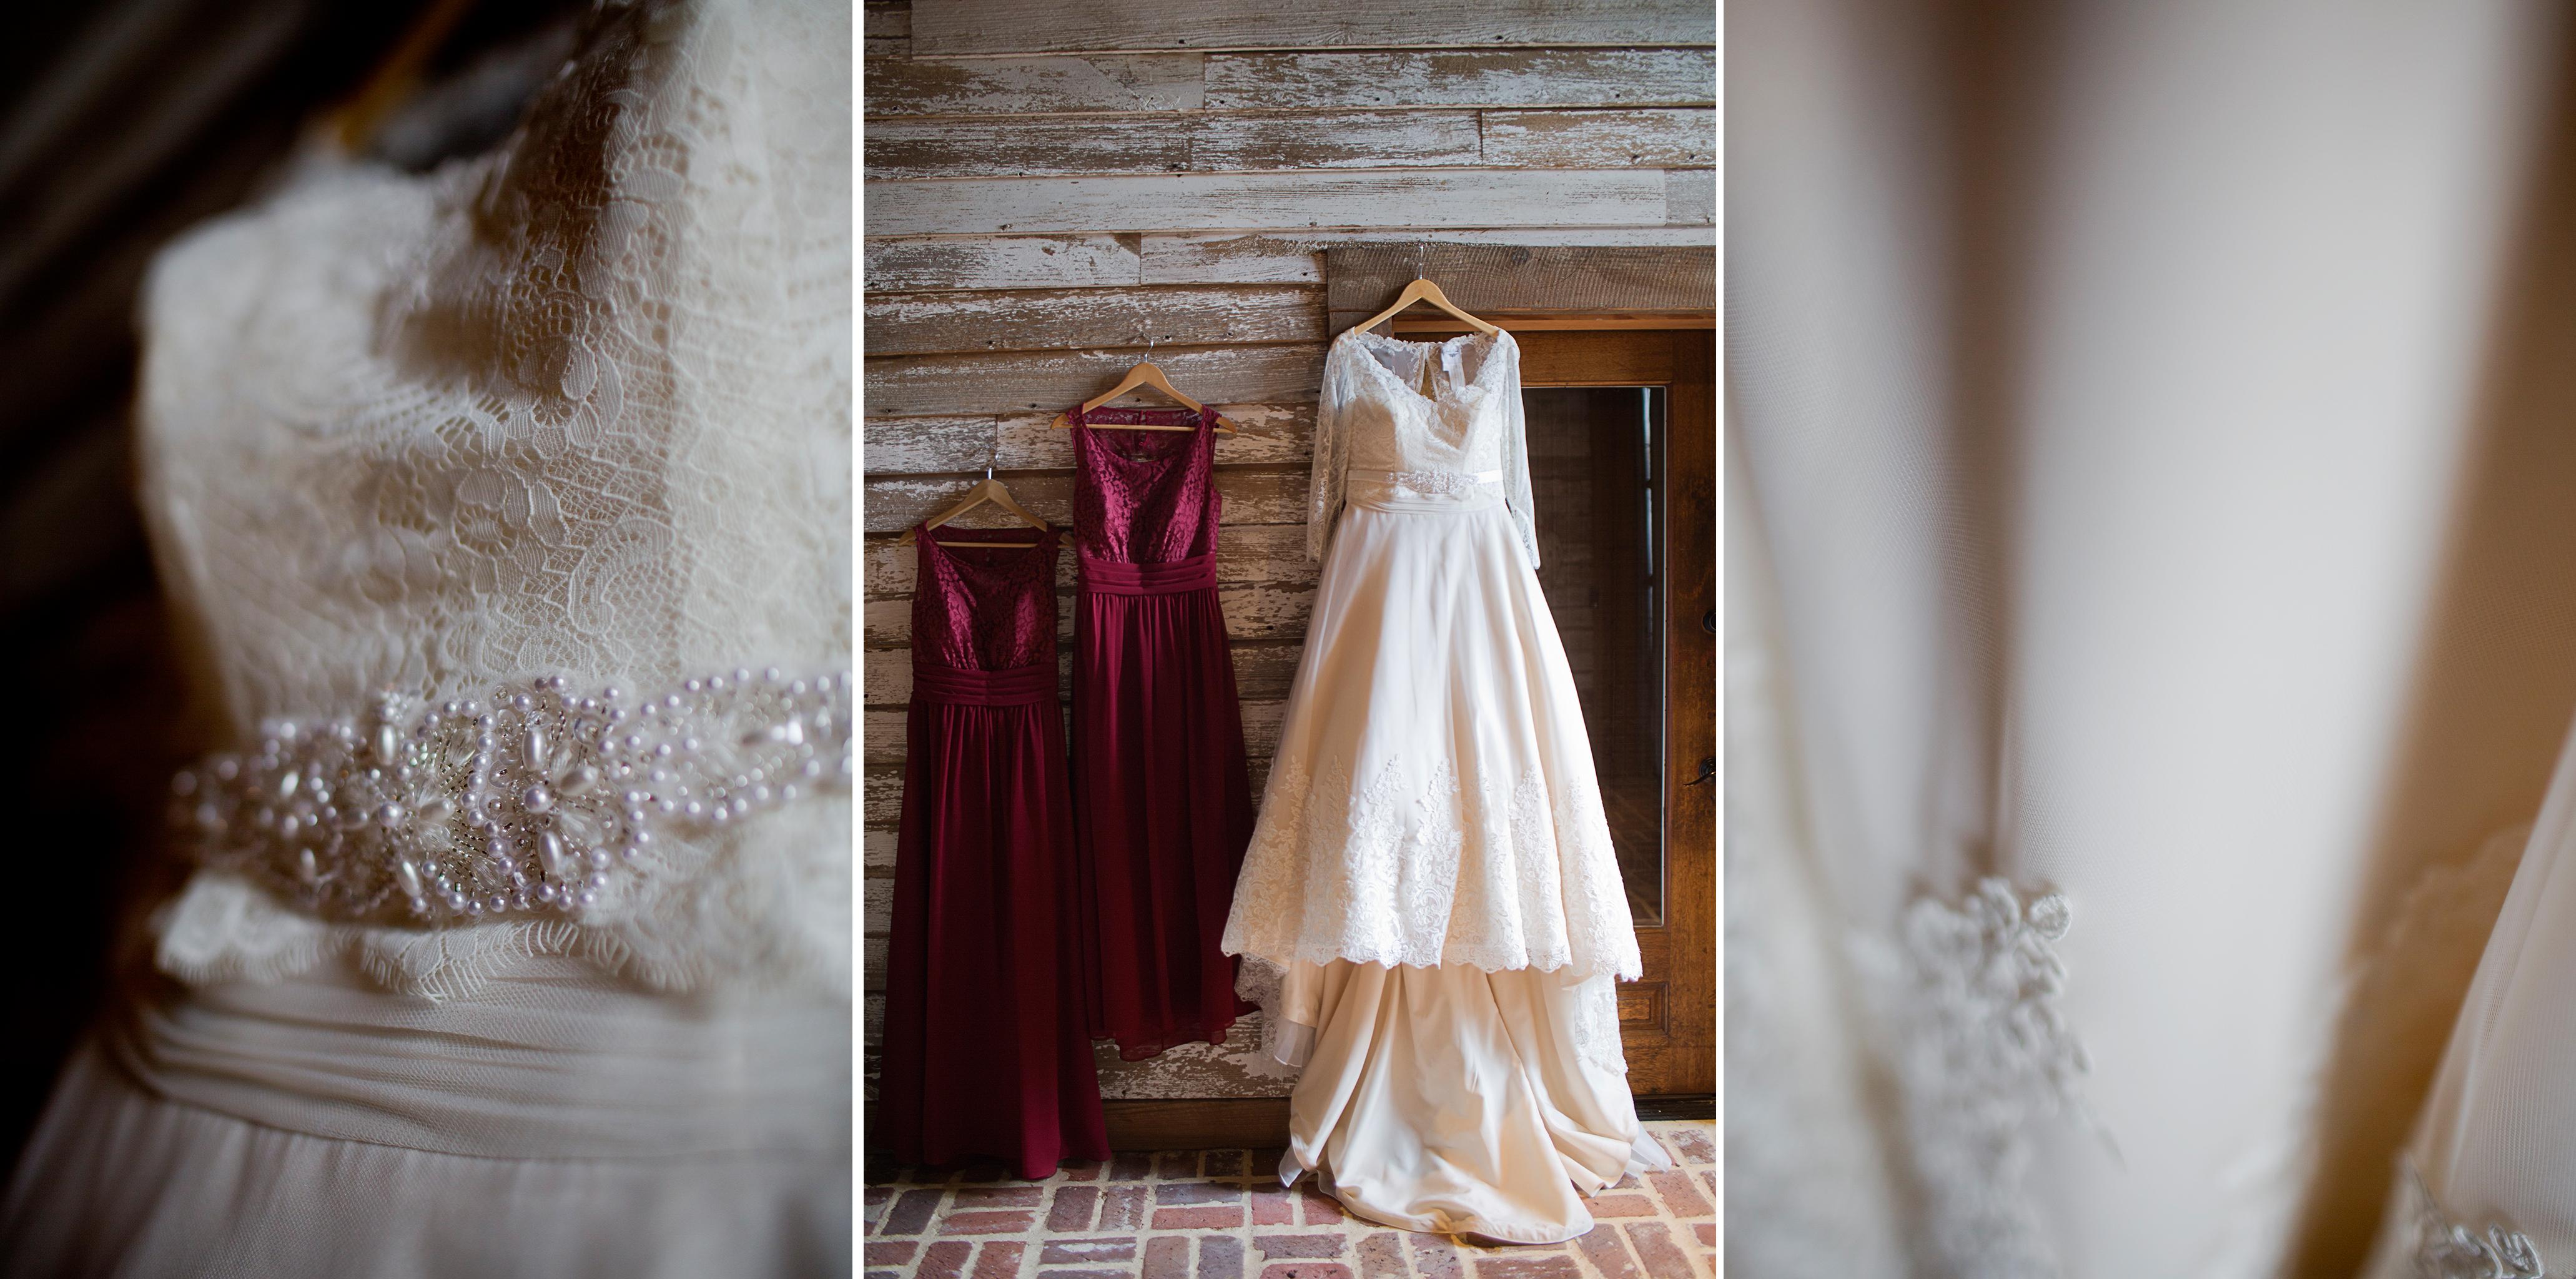 02-lace-sleeve-wedding-dress